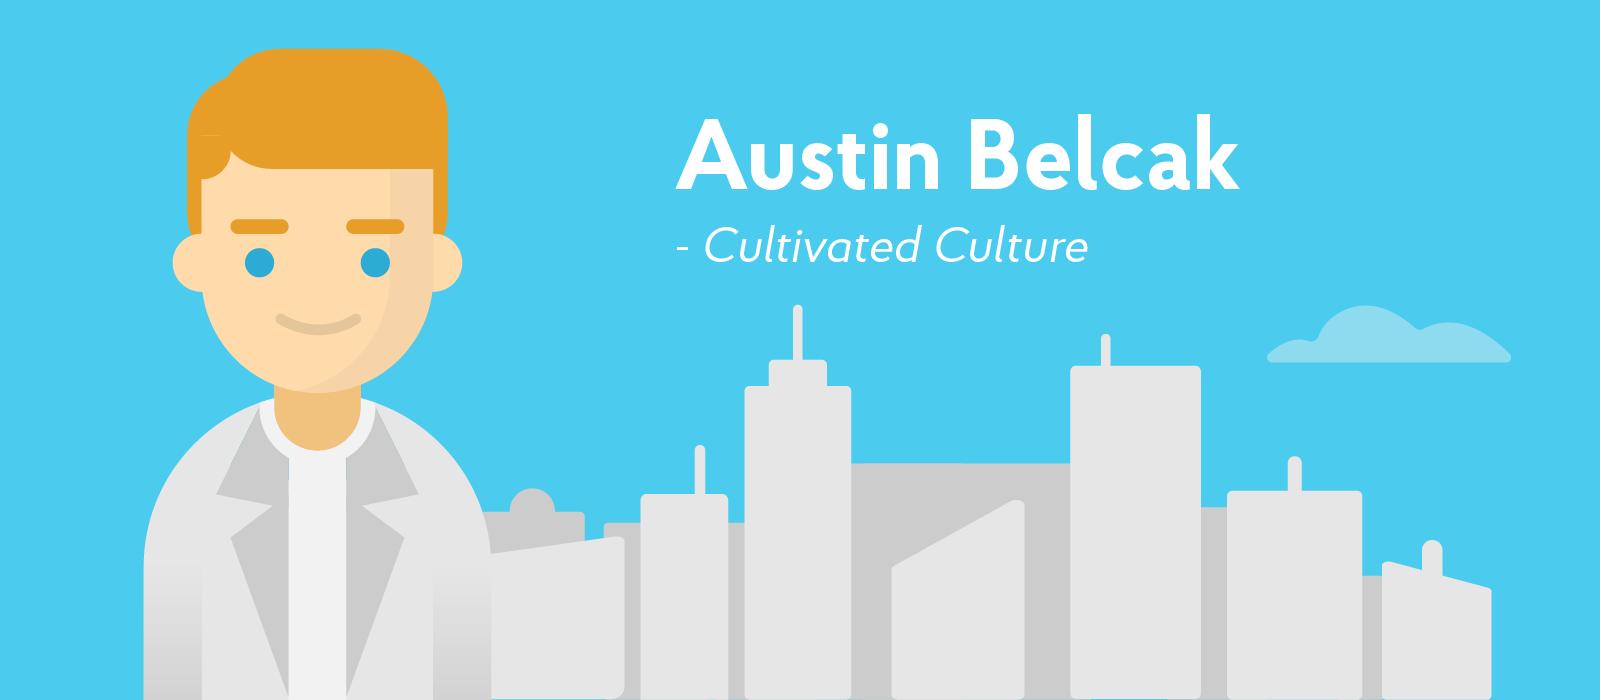 Austin Belcak career influencer